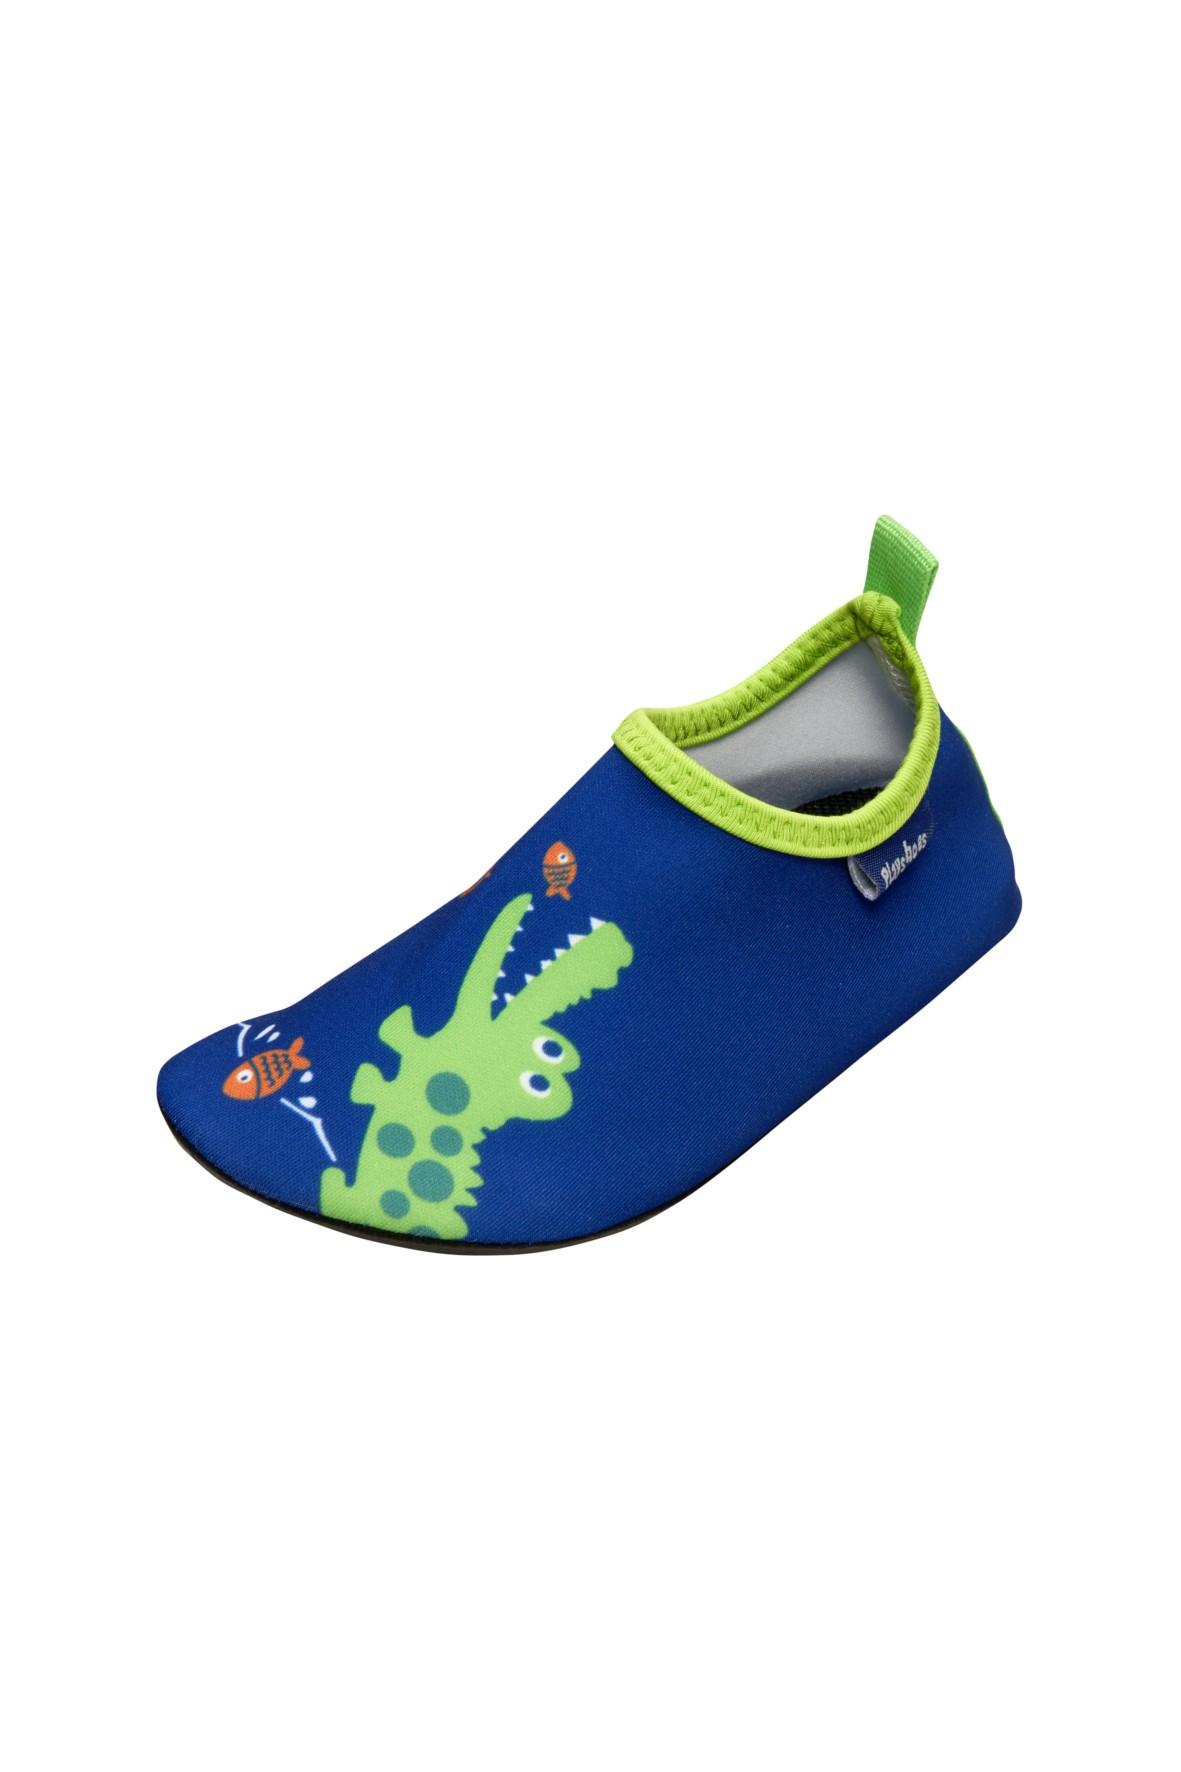 Buty kąpielowe- granatowe z krokodylem